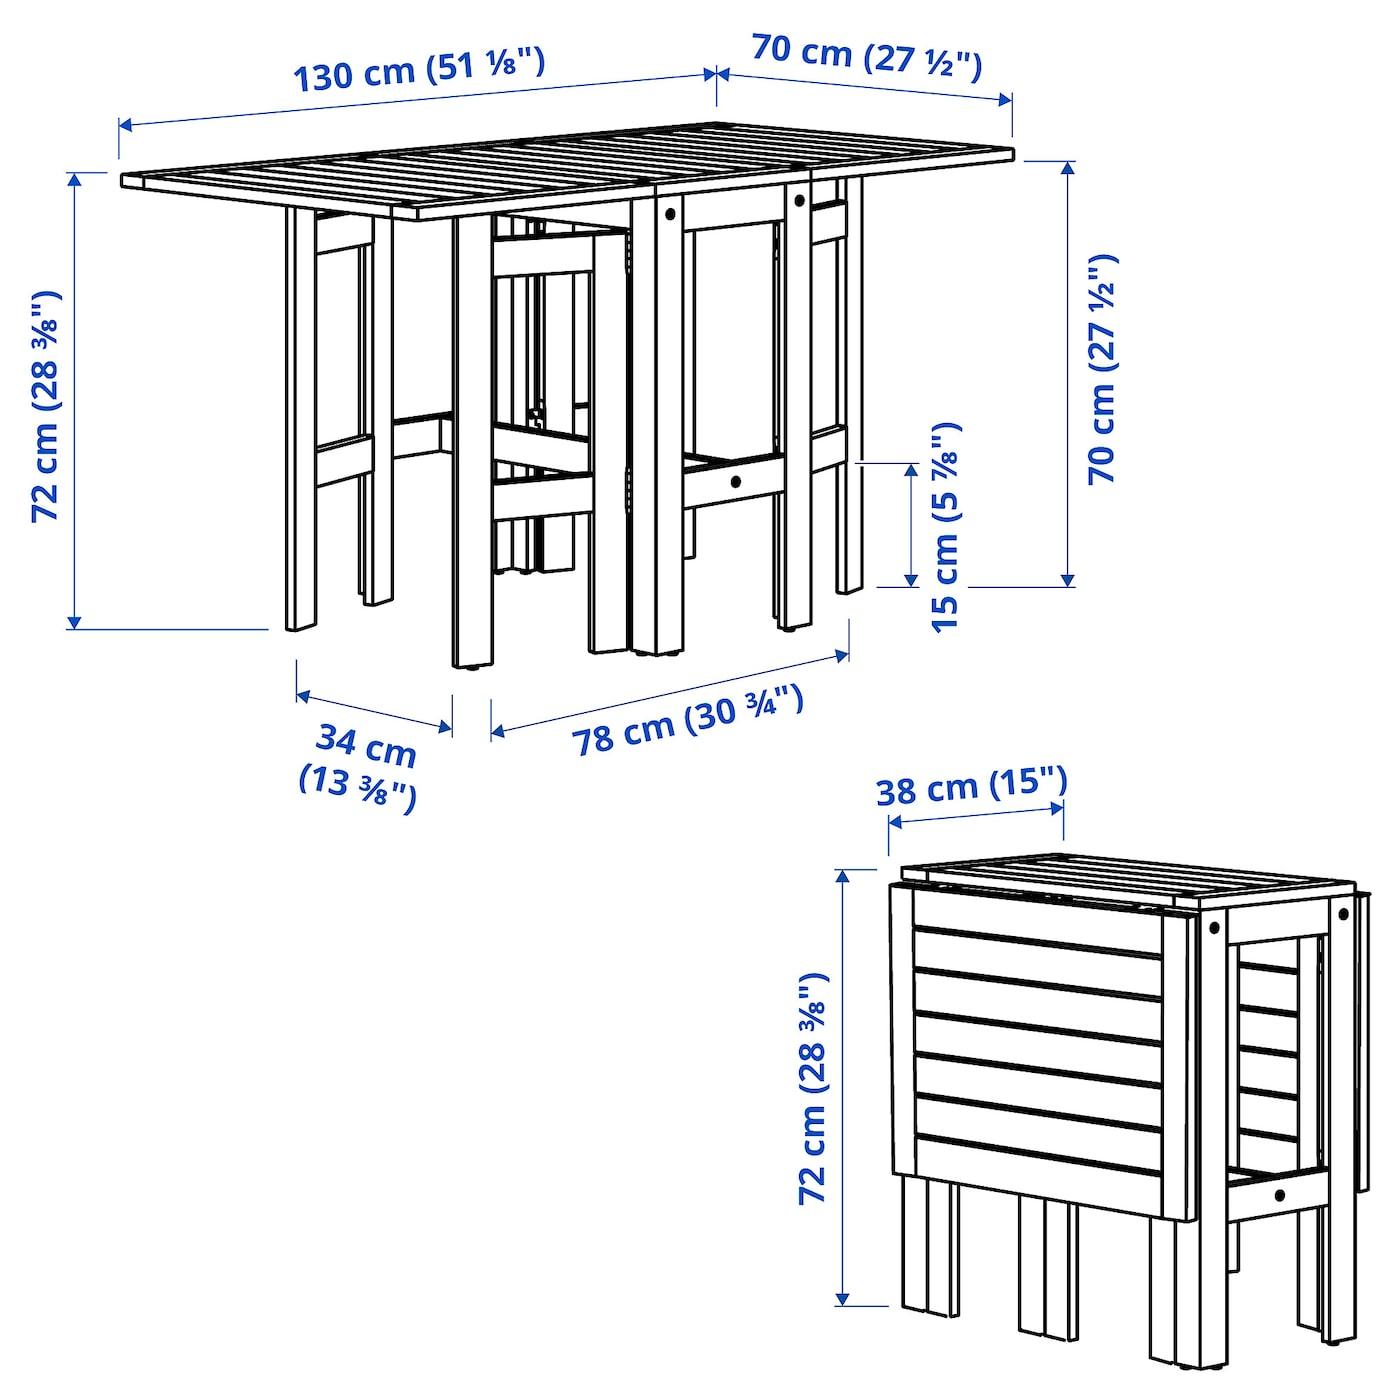 Applaro Gateleg Table Outdoor Brown Stained 34 83 131x70 Cm Ikea